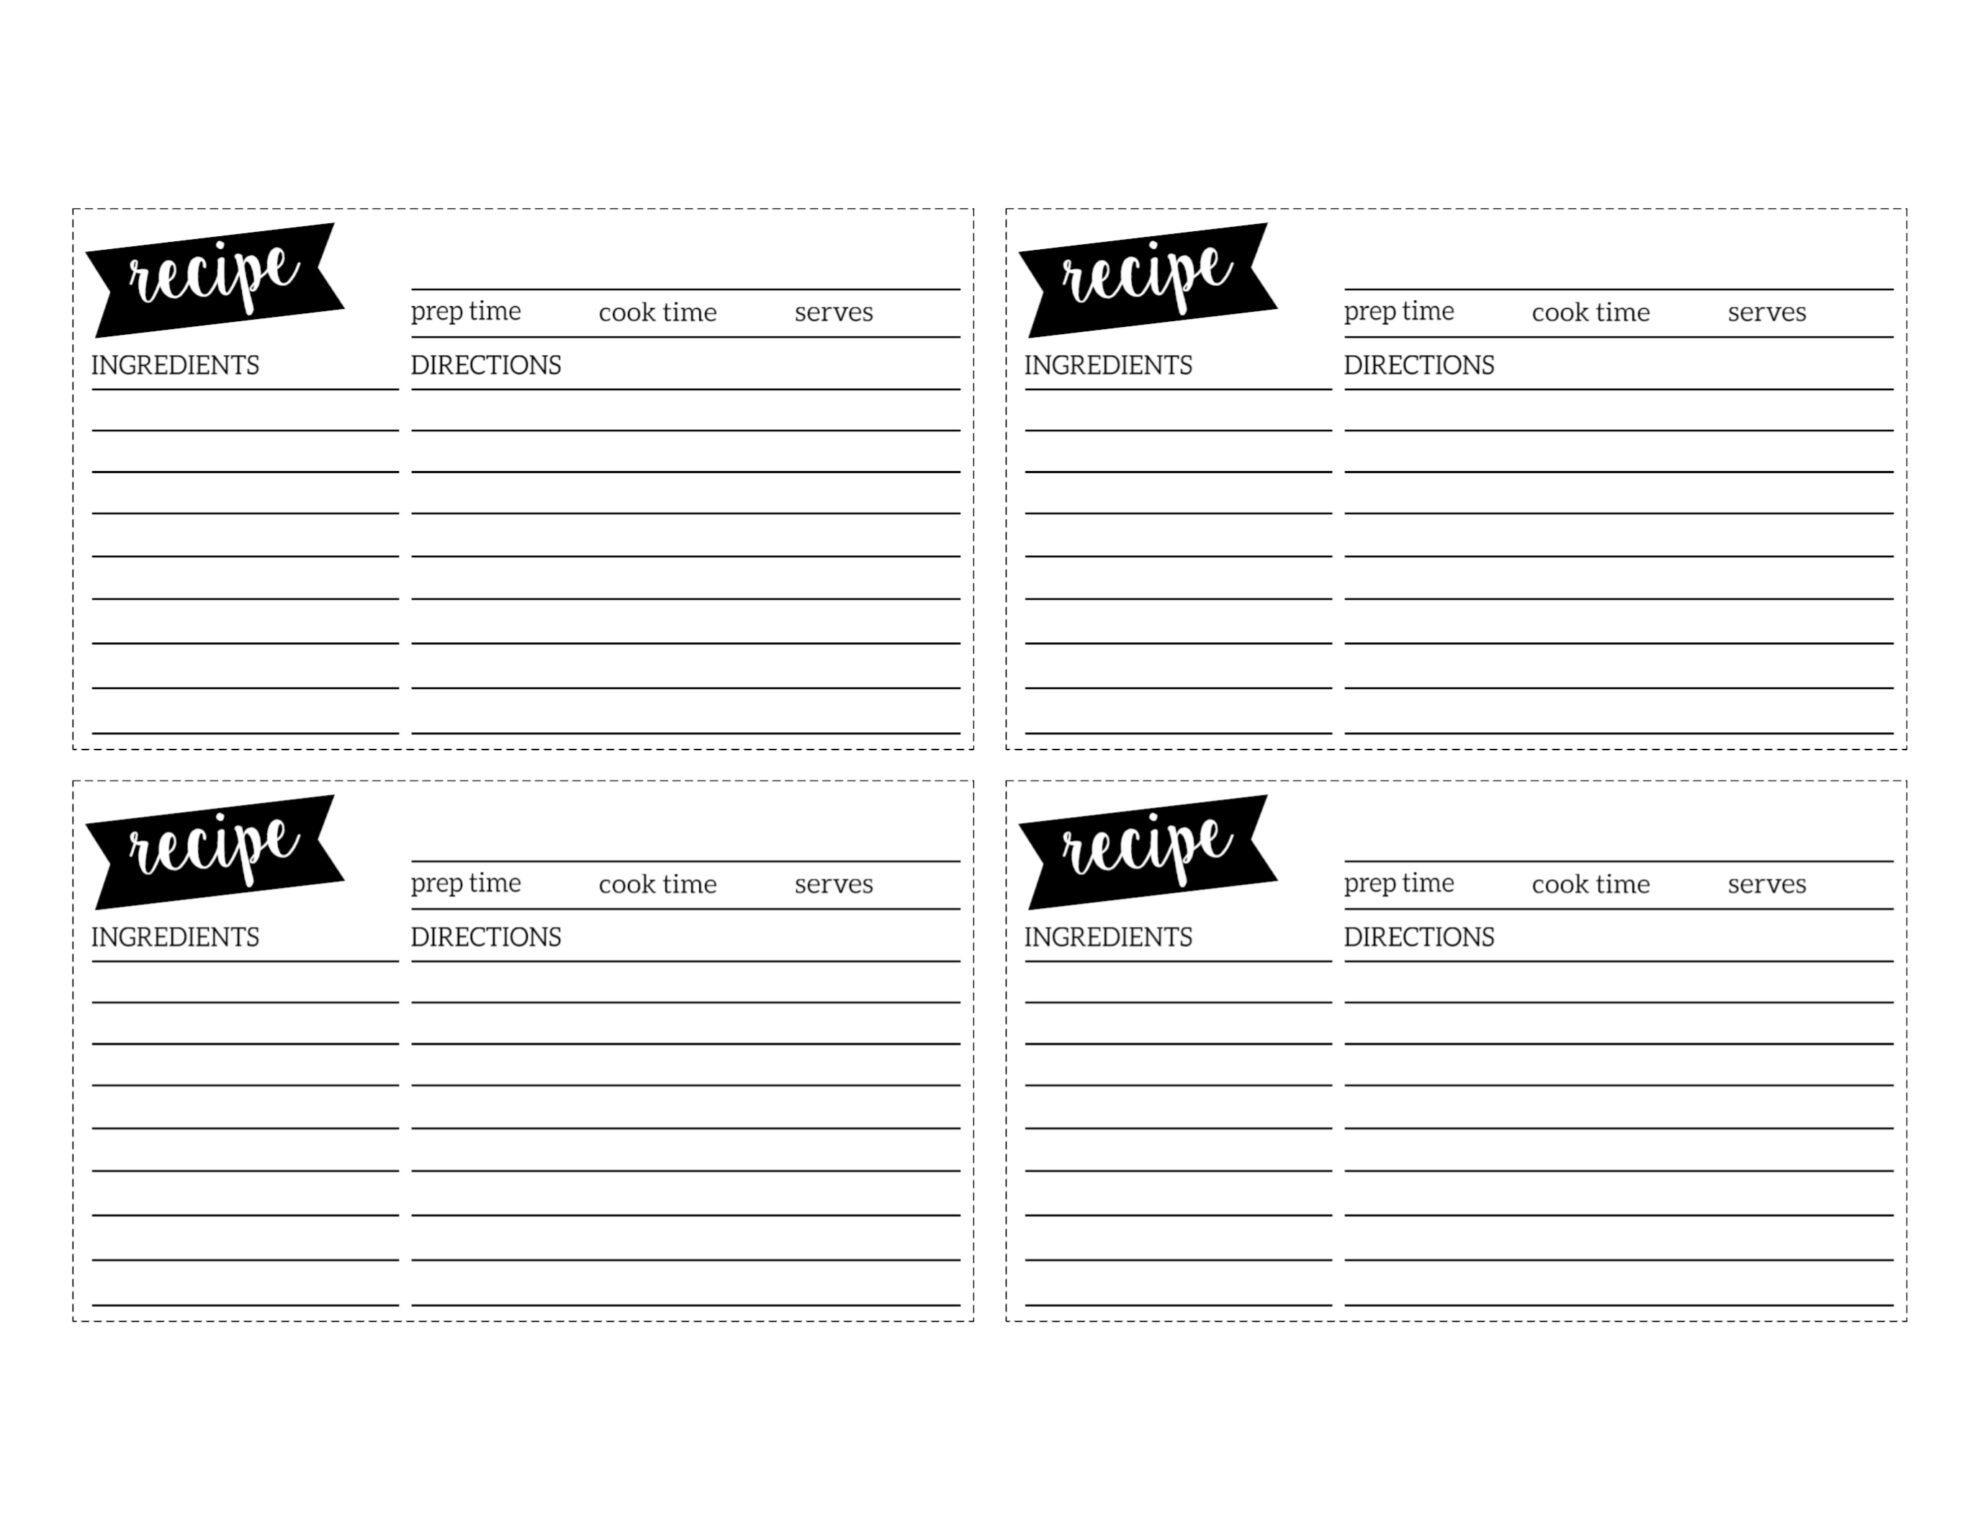 Free Recipe Card Template Printable - Paper Trail Design - Free Printable Recipe Cards